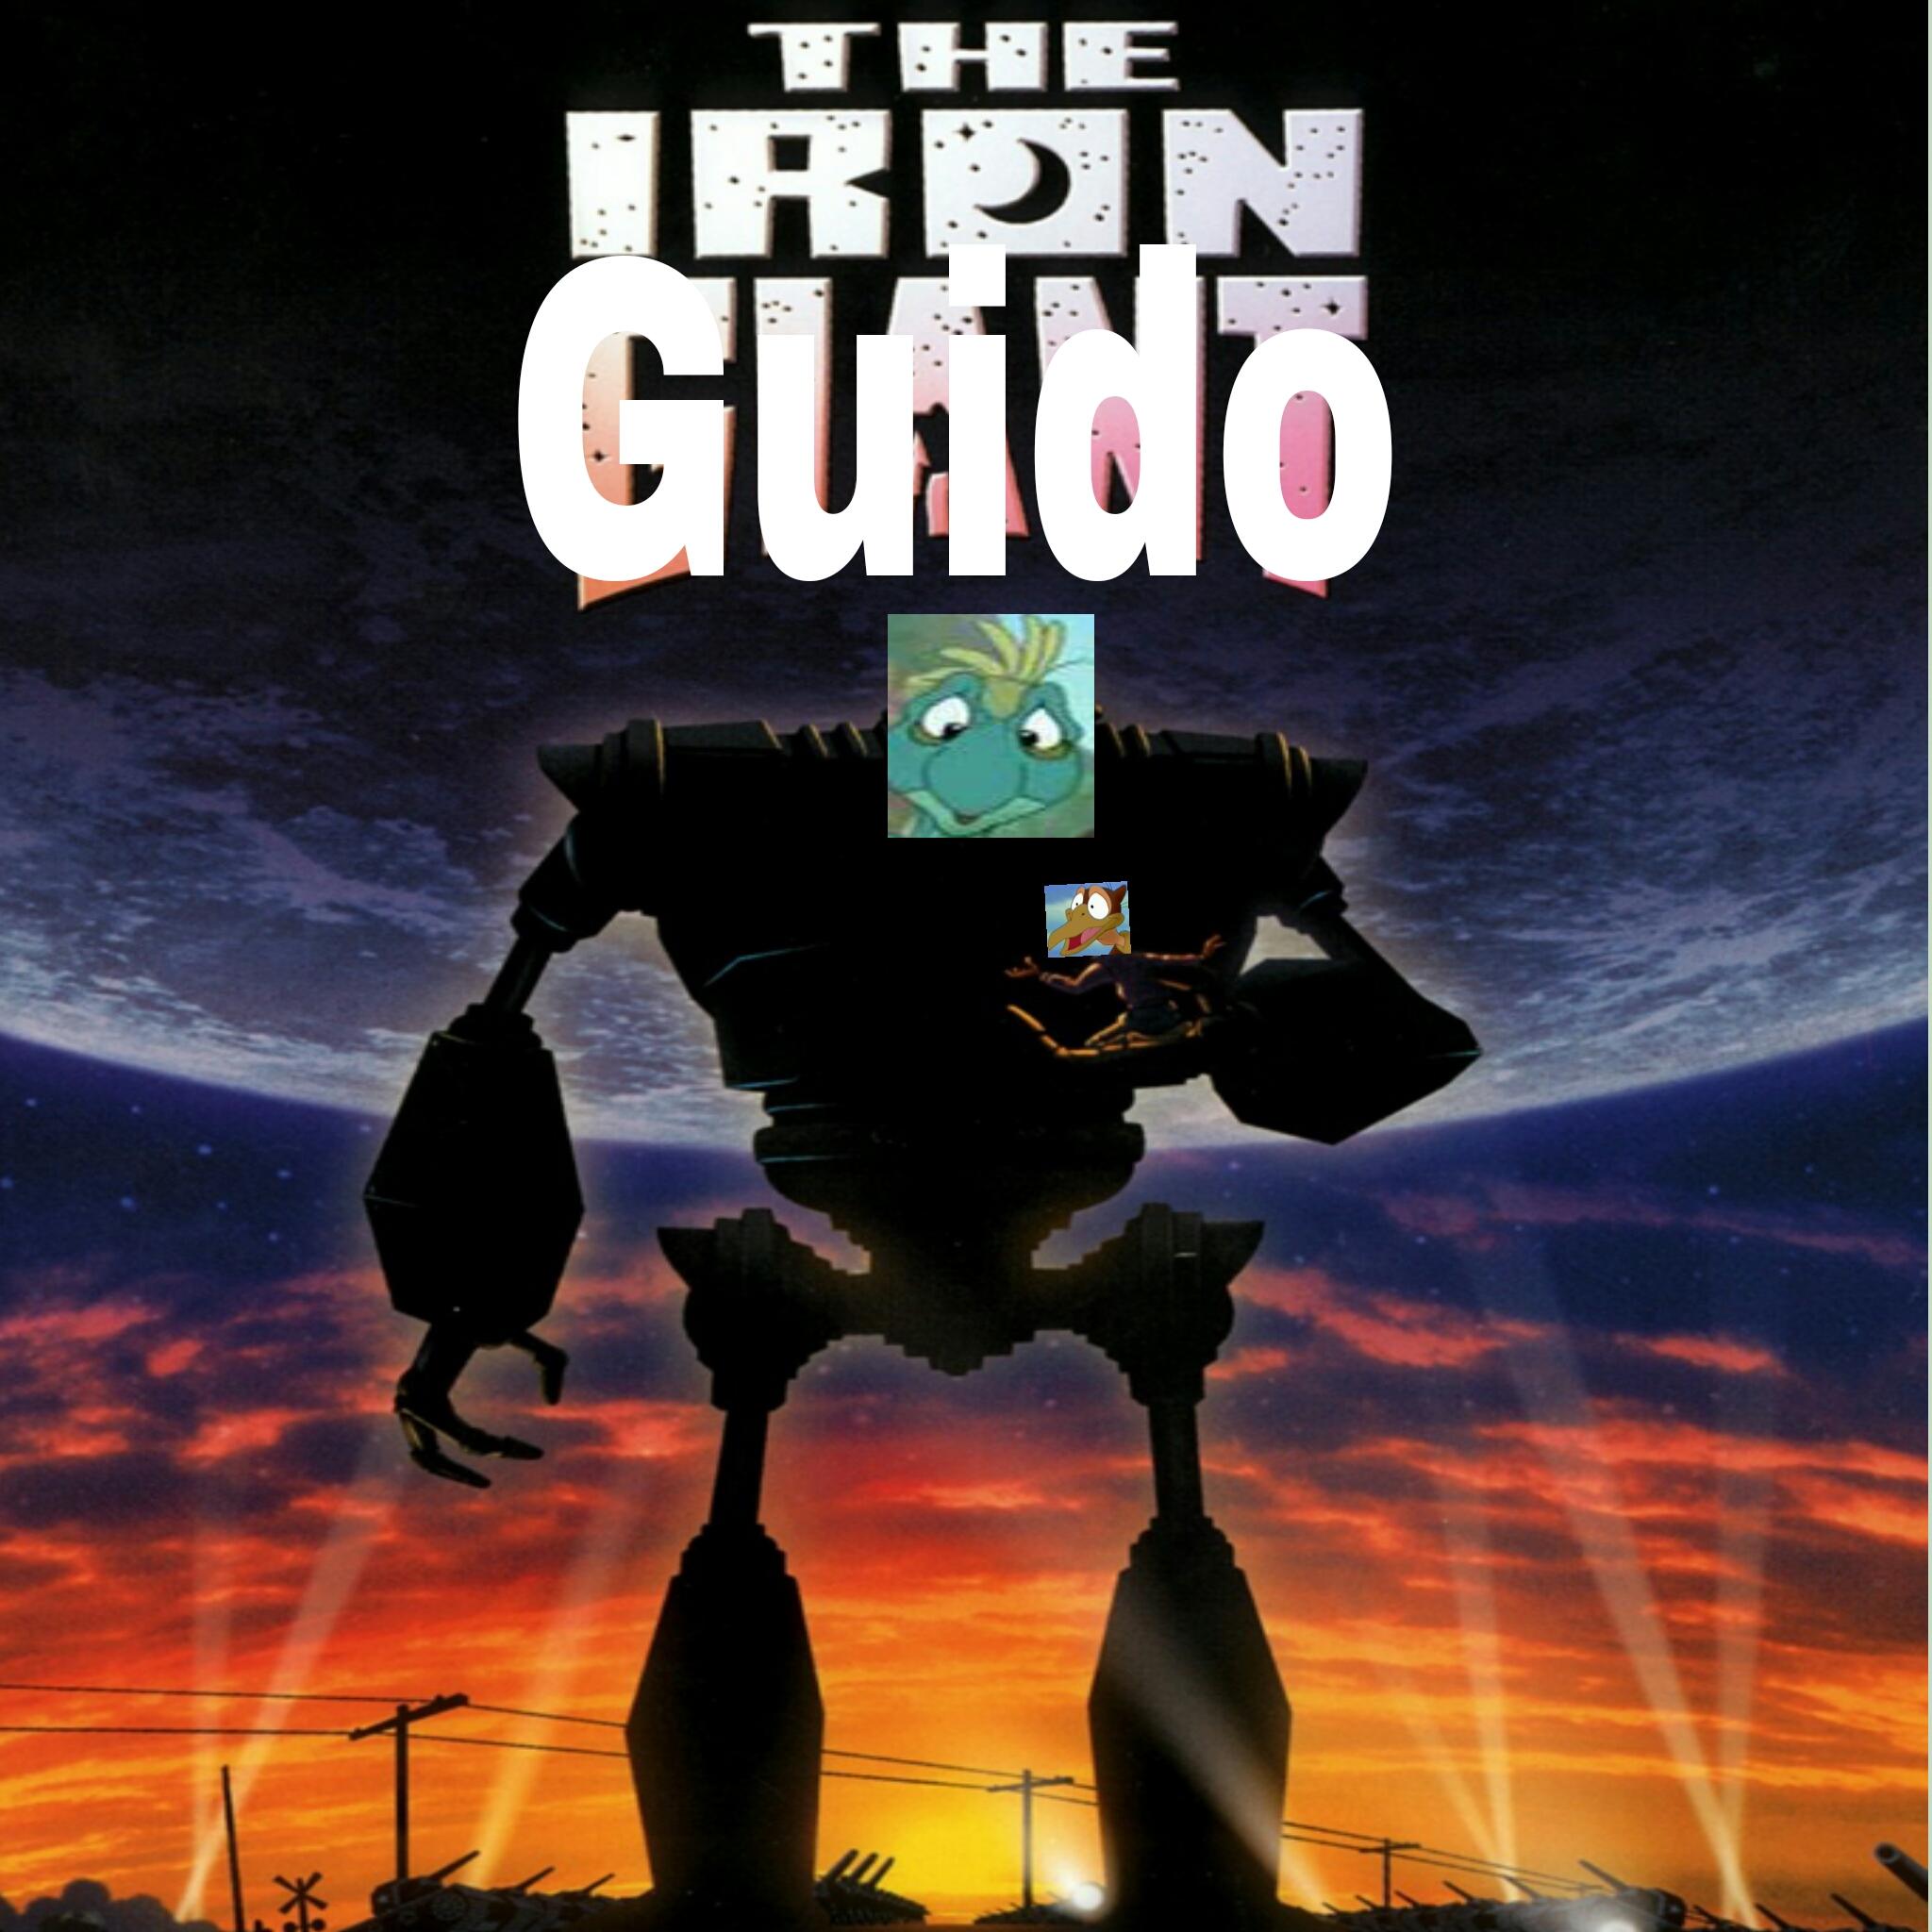 The Iron Guido